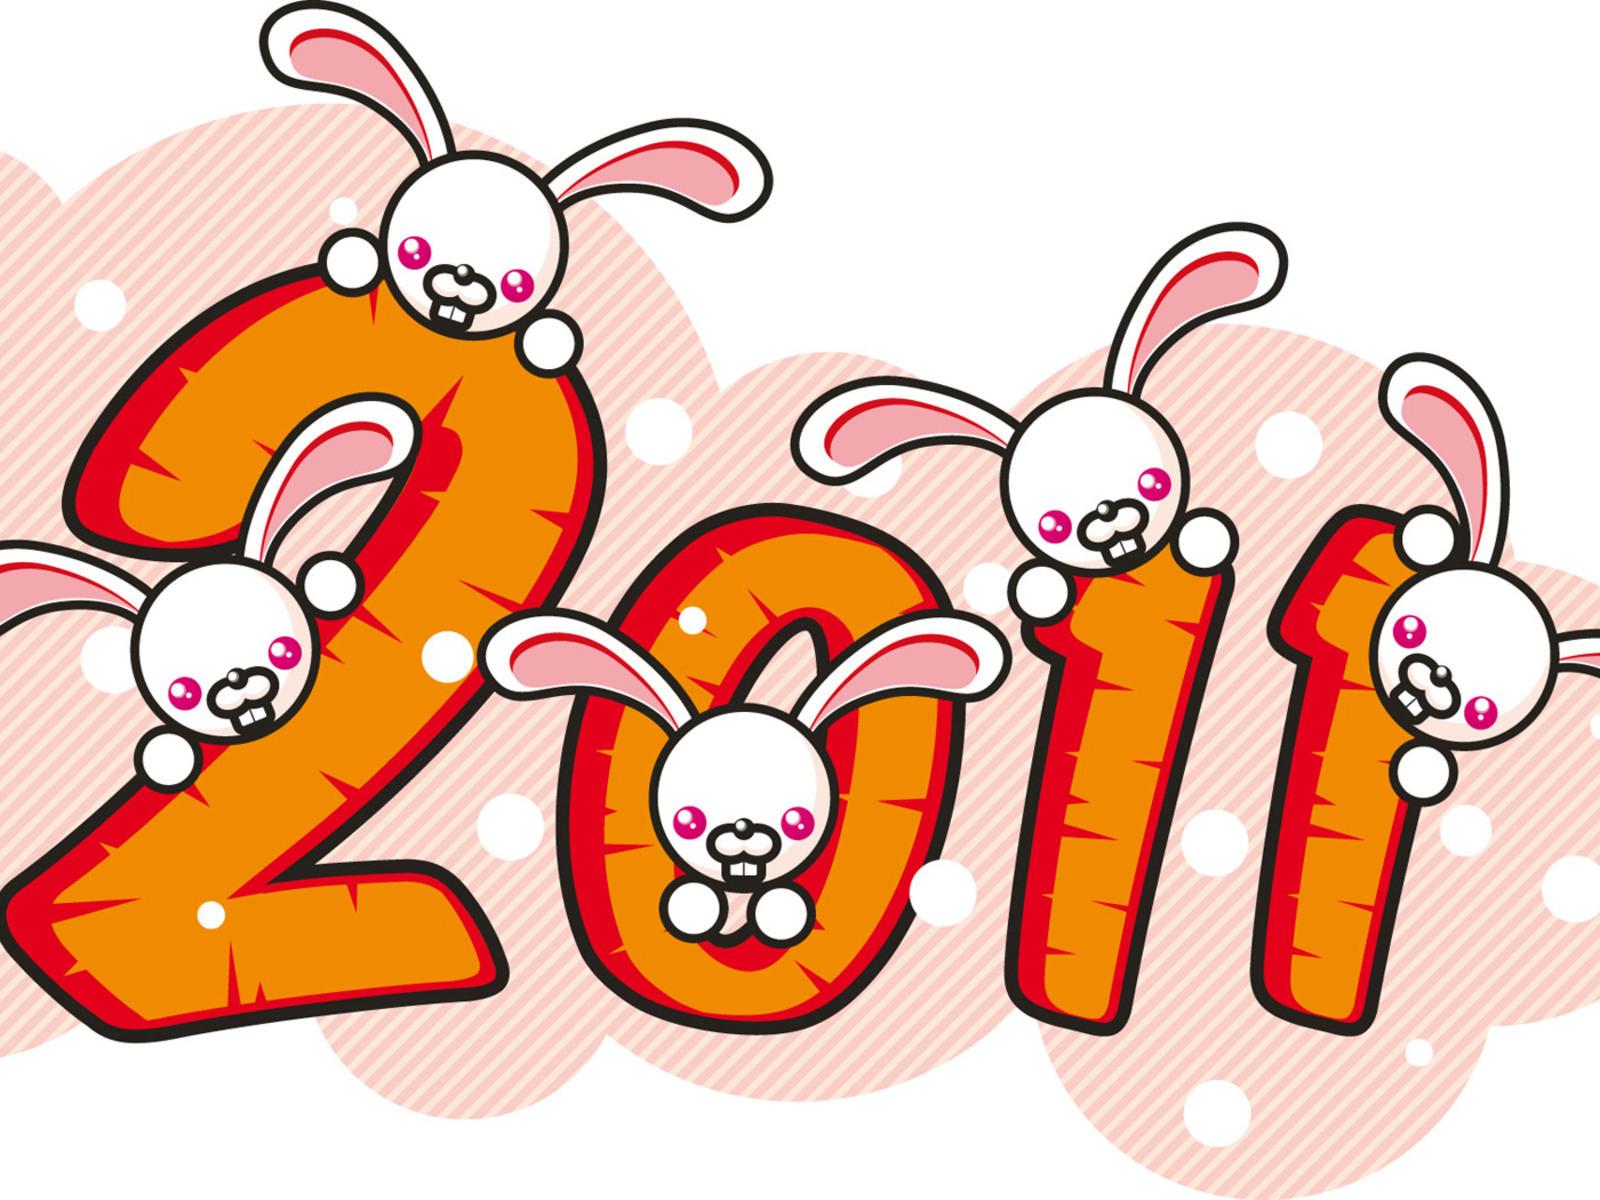 New_Year_2011_2011_year_Rabbit_026309_.jpg